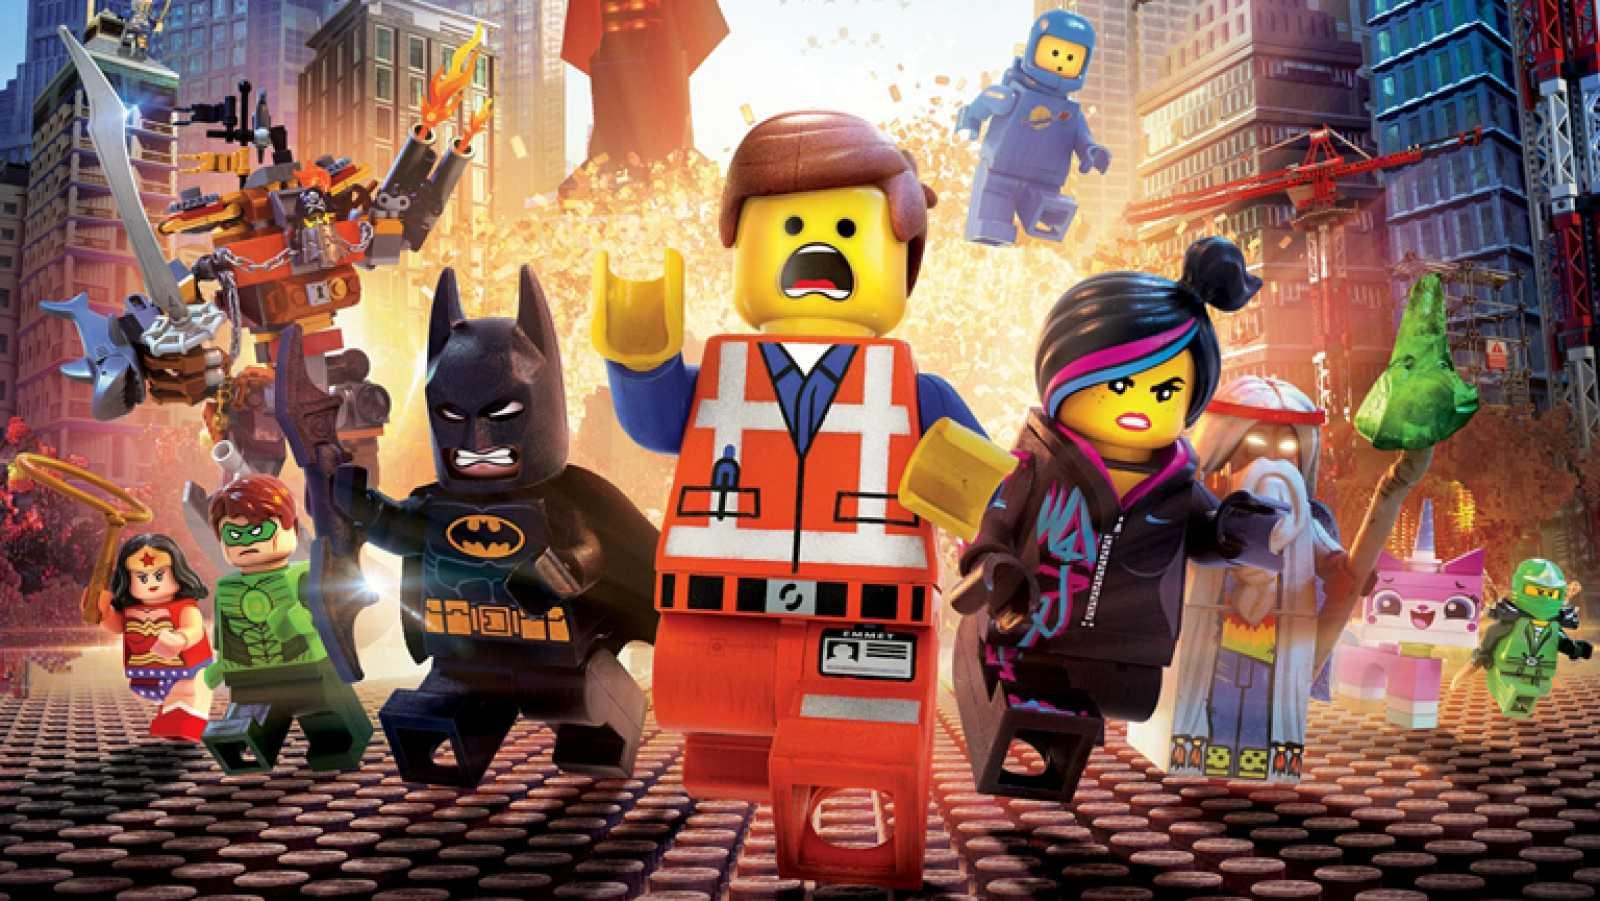 Tráiler de 'La Lego película'